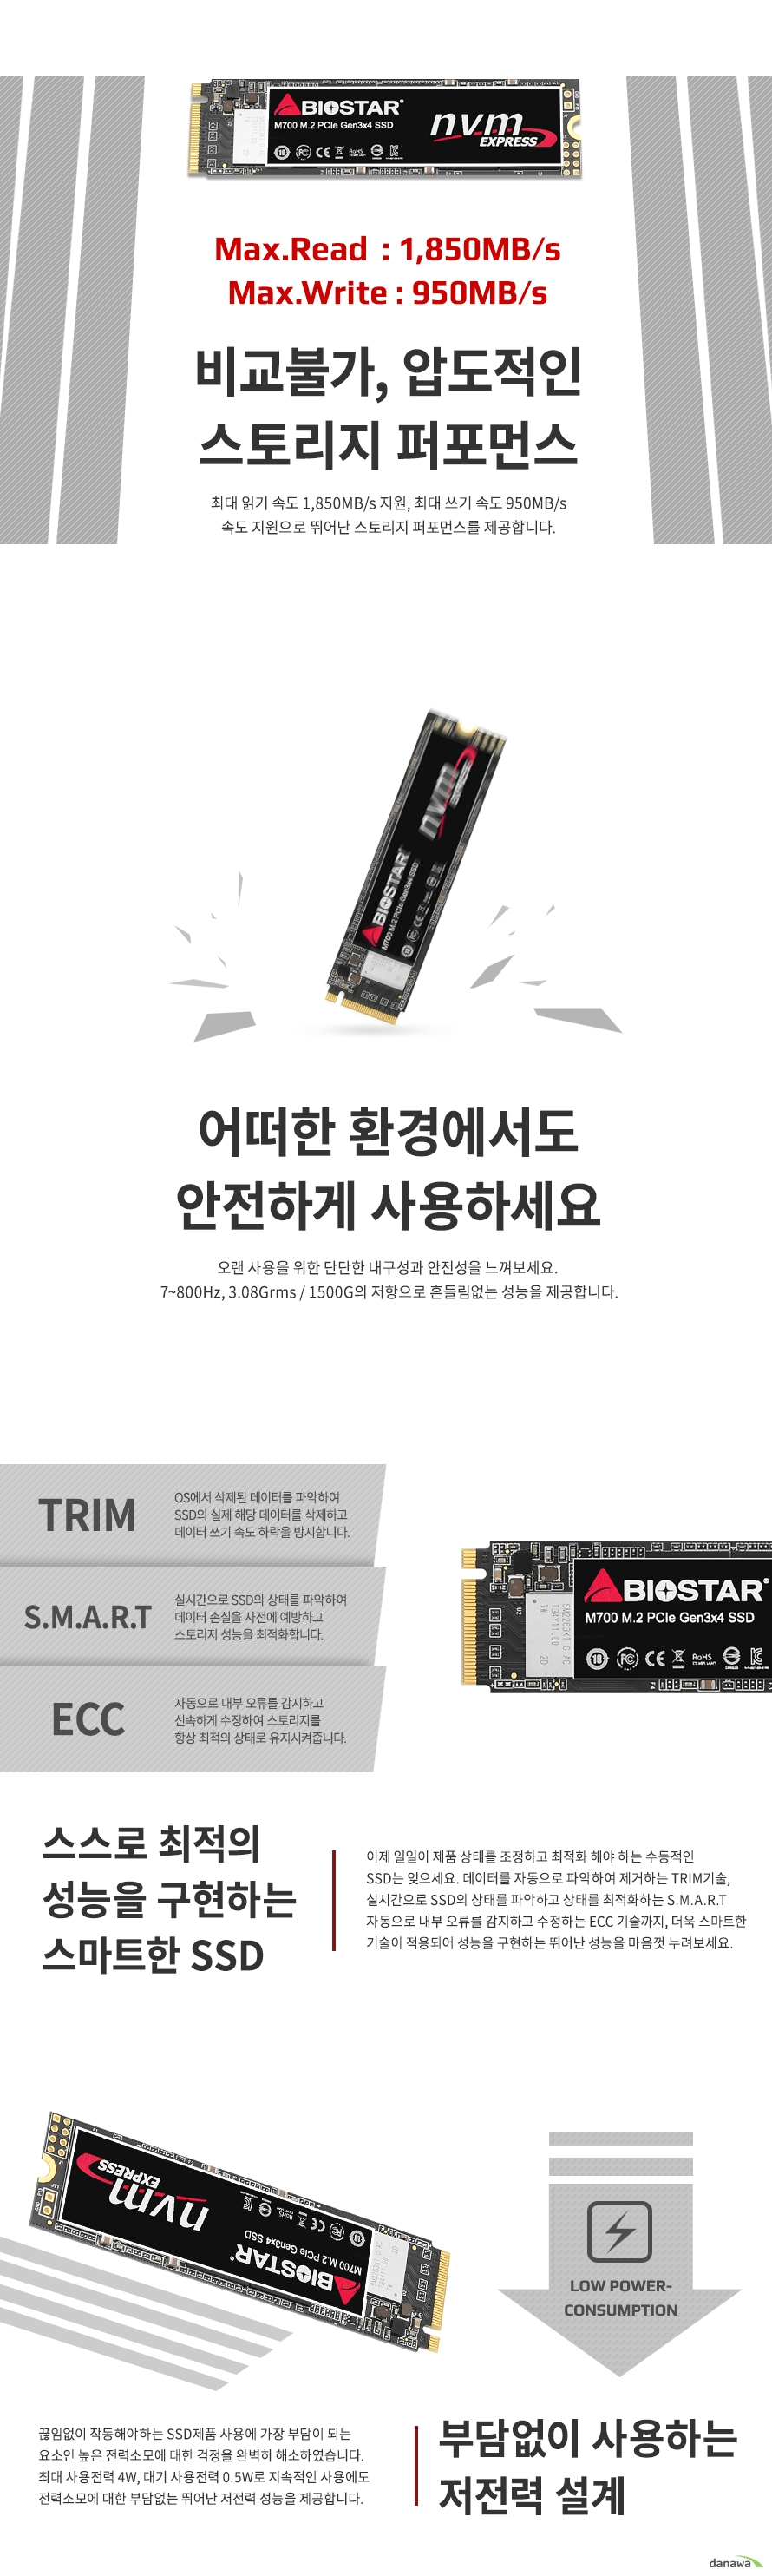 BIOSTAR M700 M.2 NVMe (256GB)